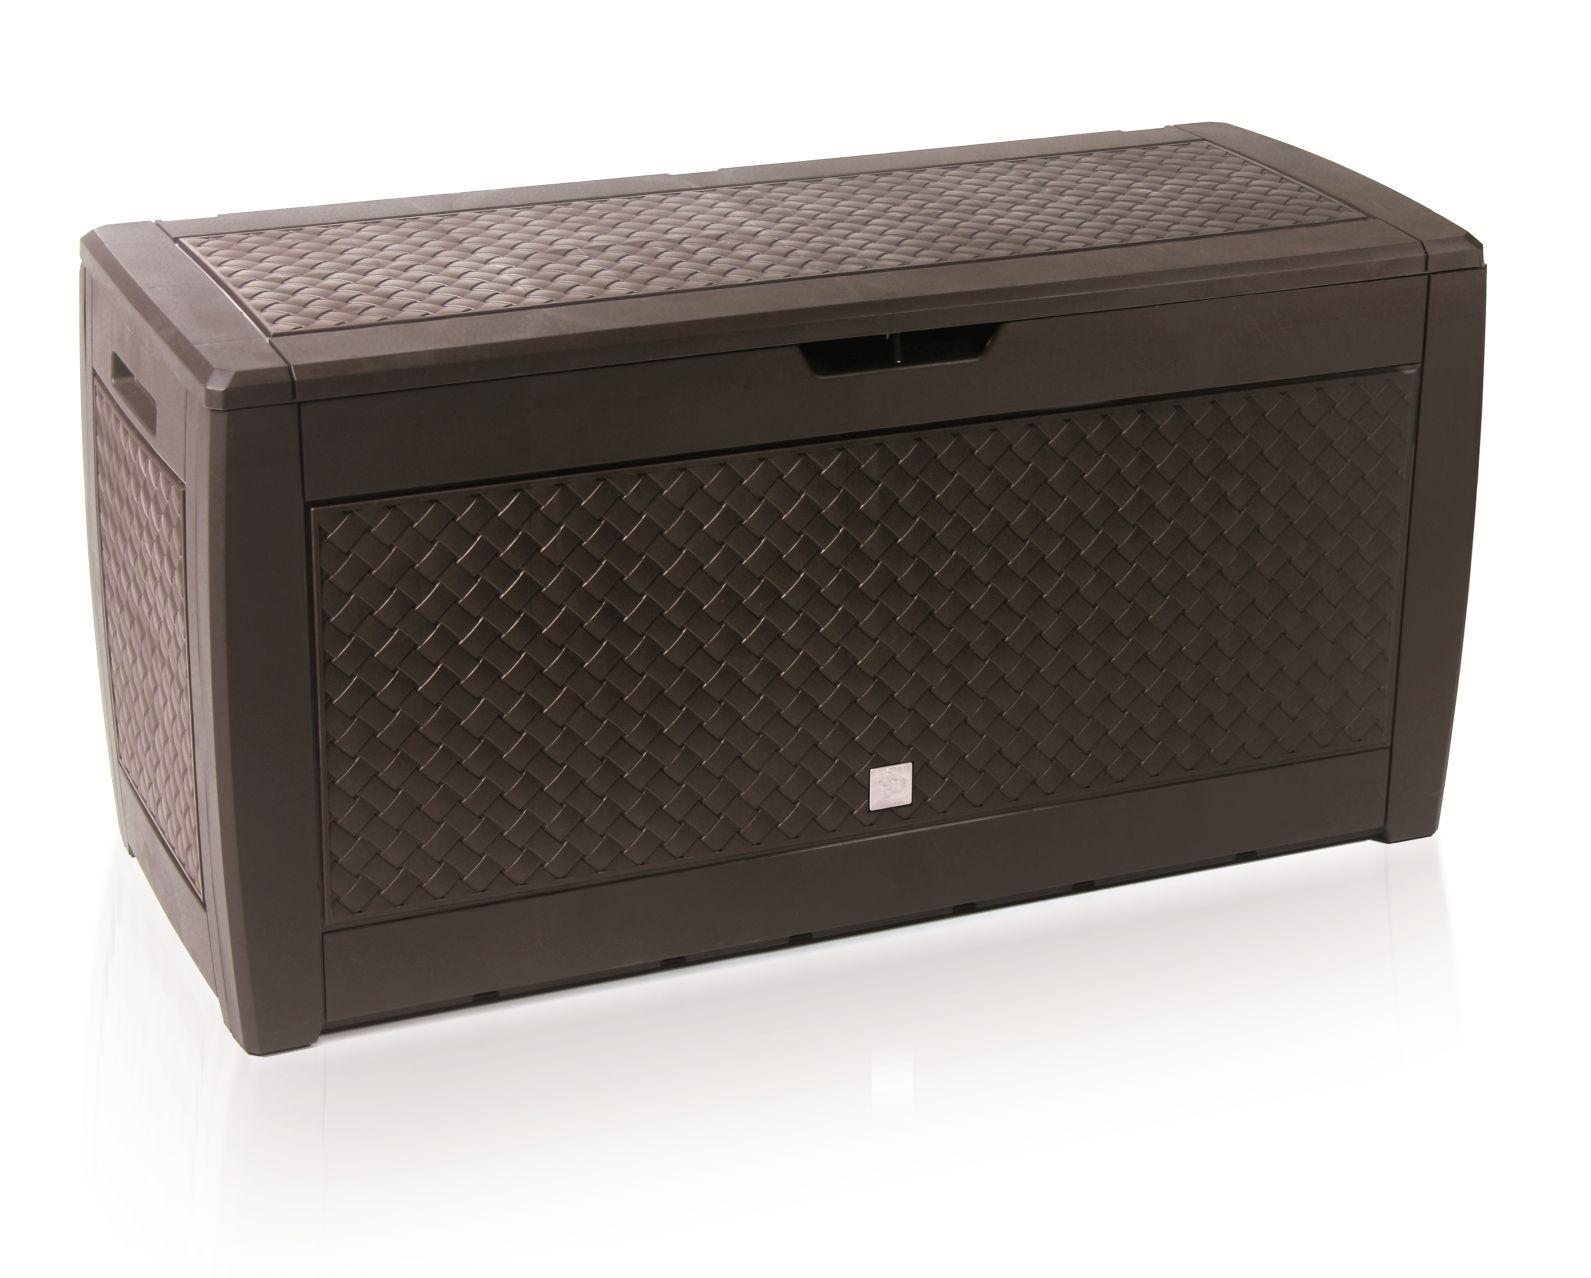 PROSPERPLAST Zahradní box BOXE MATUBA umbra 119cm - 310L